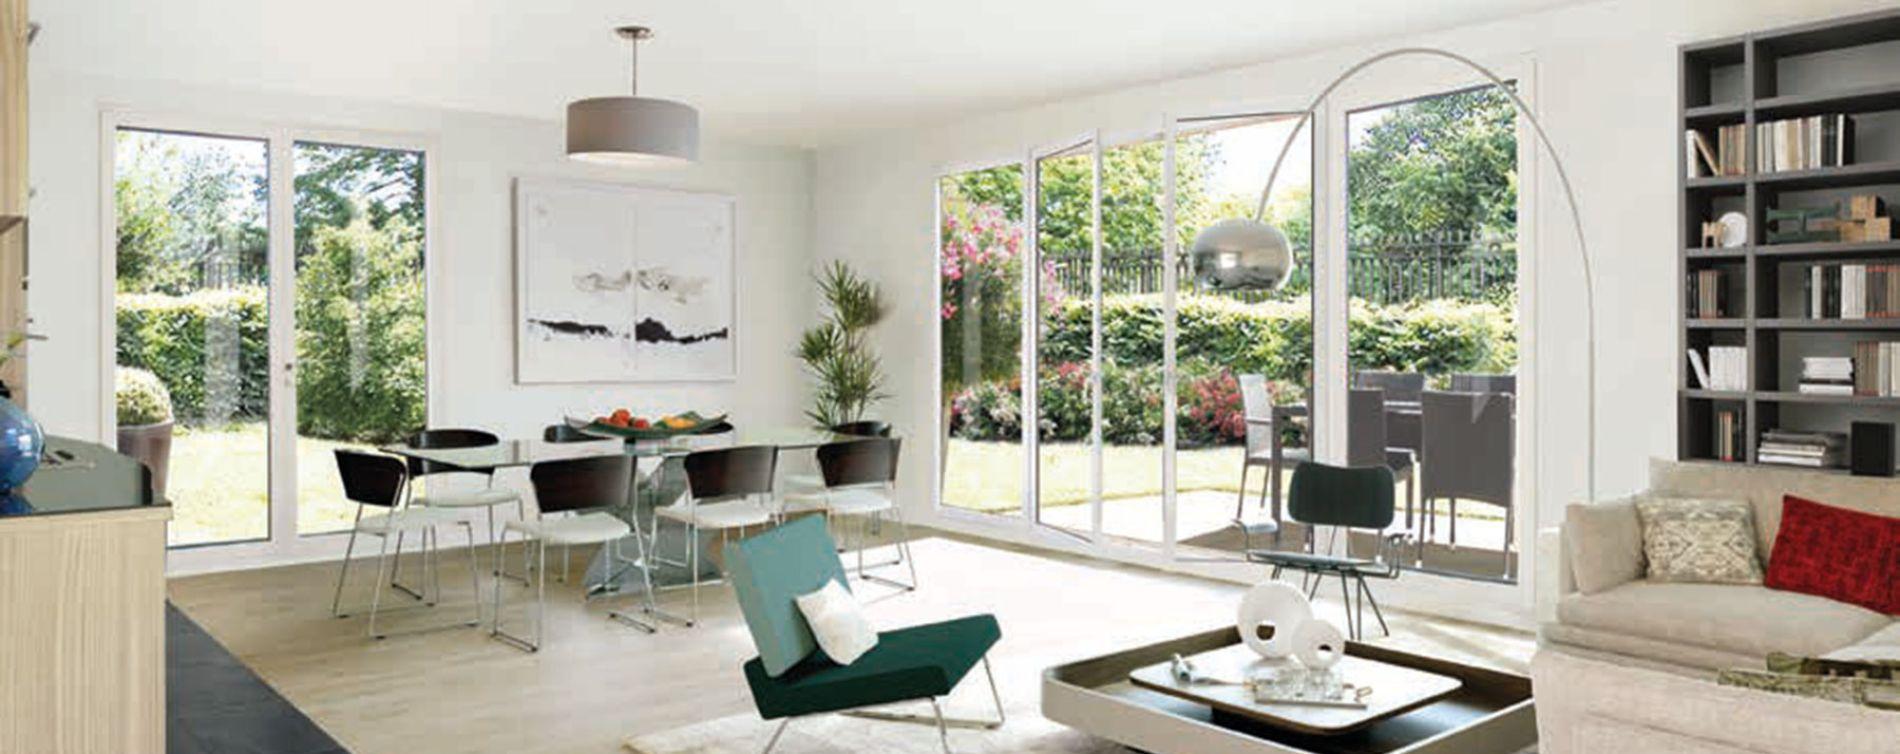 Noisy-le-Grand : programme immobilier neuve « Programme immobilier n°214501 » (4)